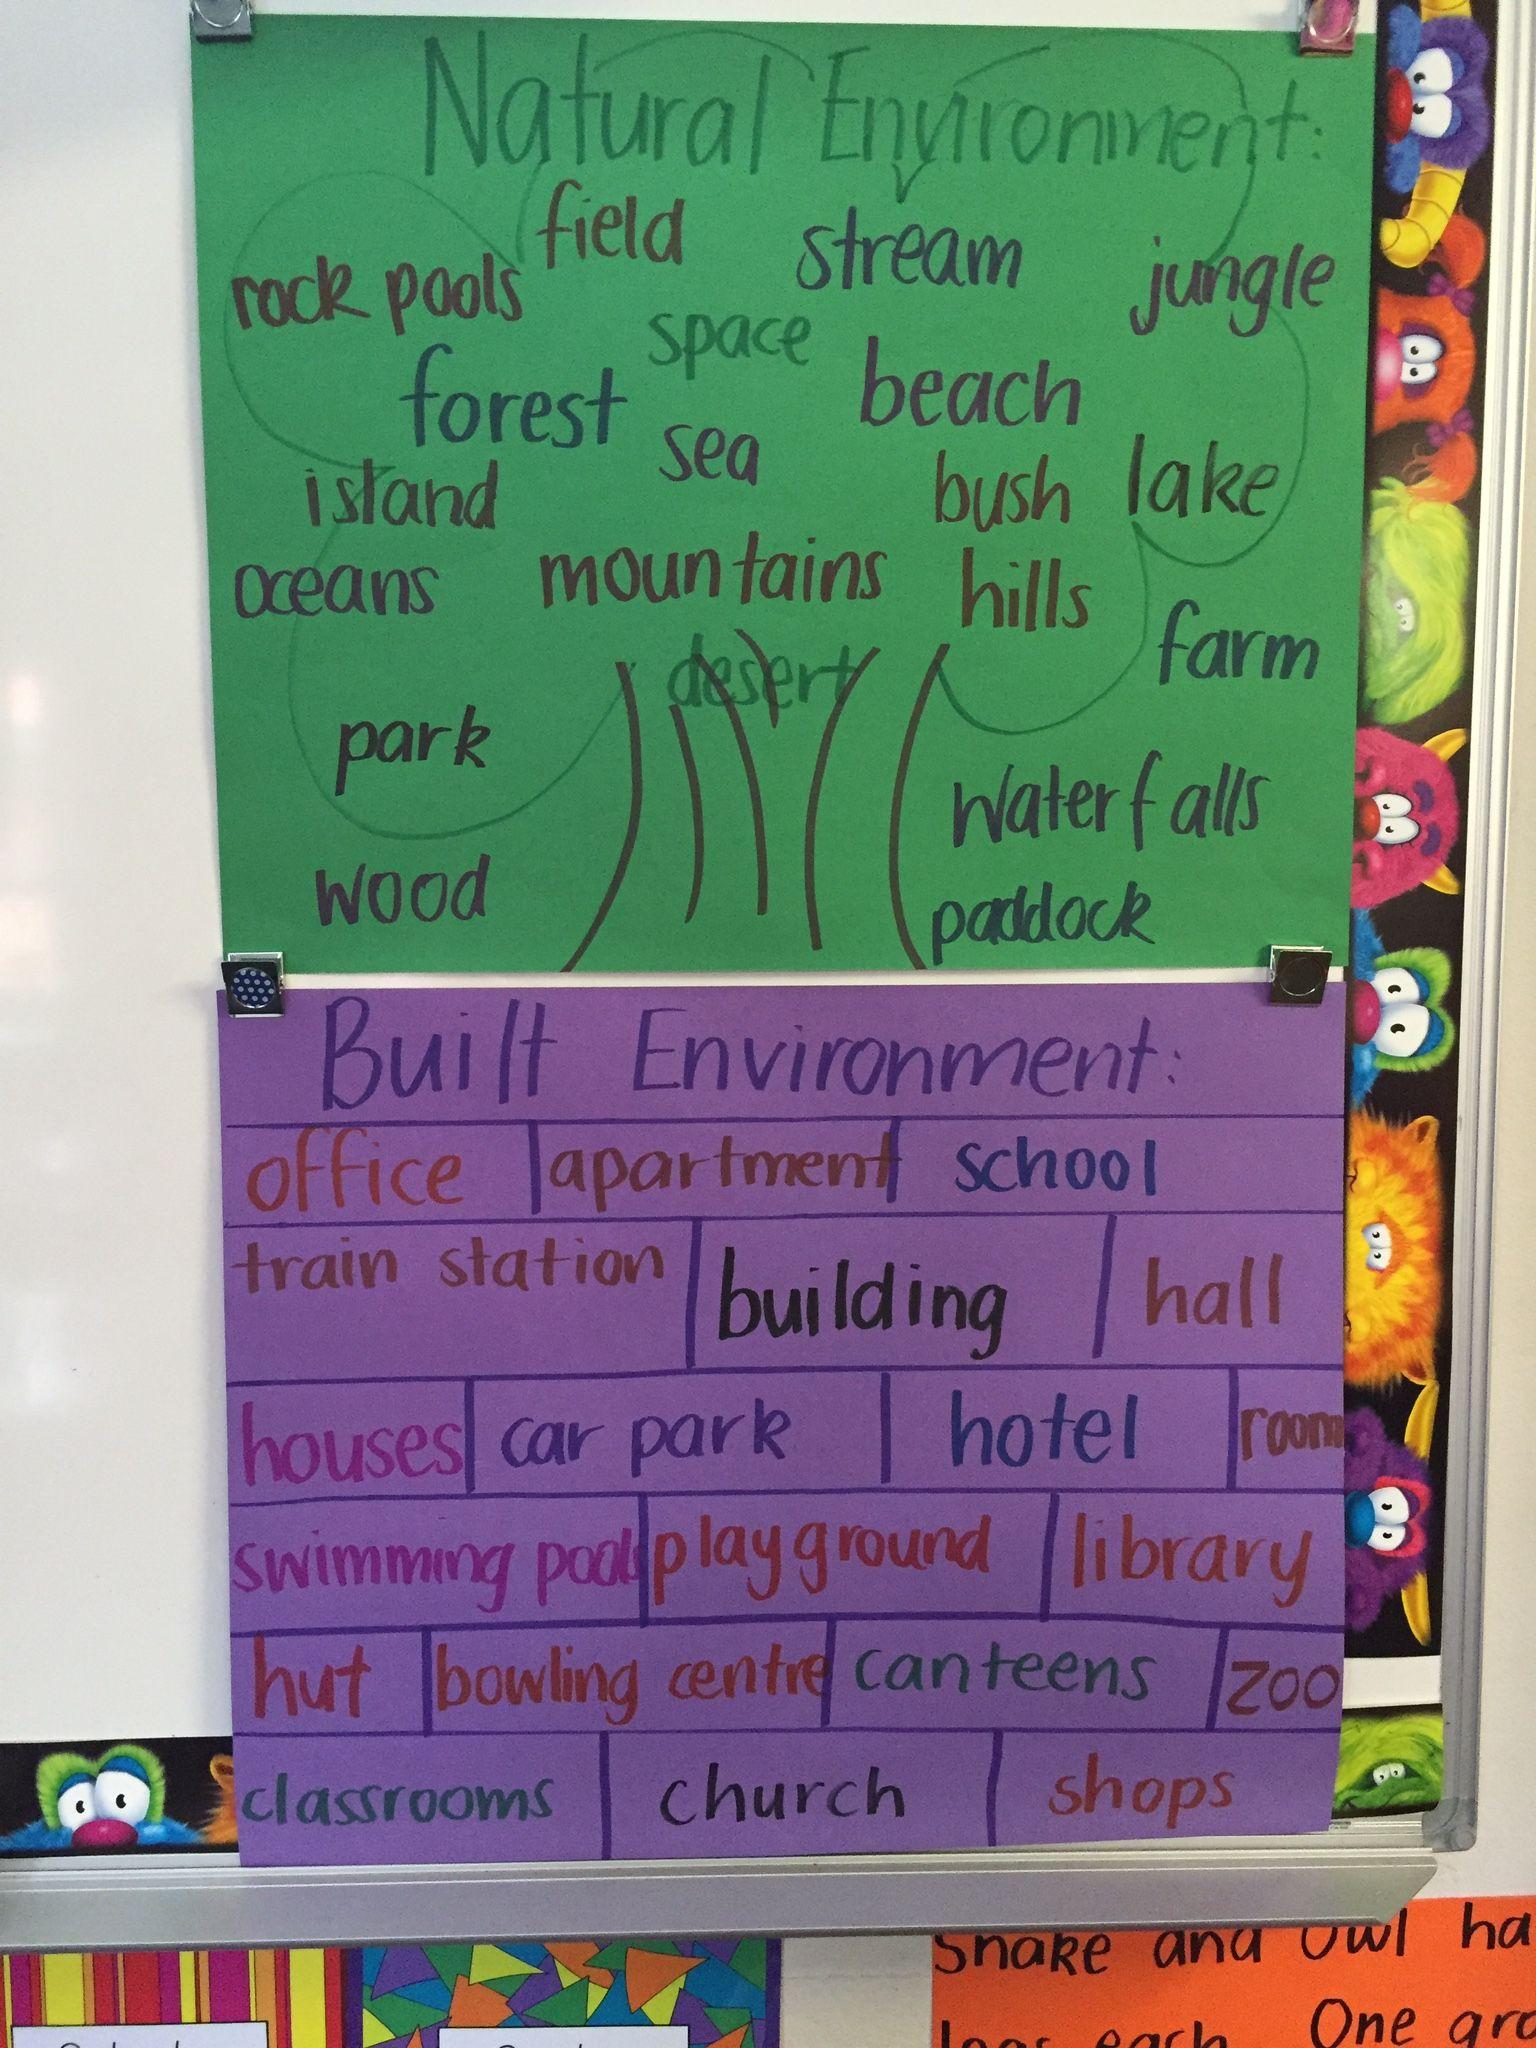 Natural And Built Environment Brainstorm Kindergarten